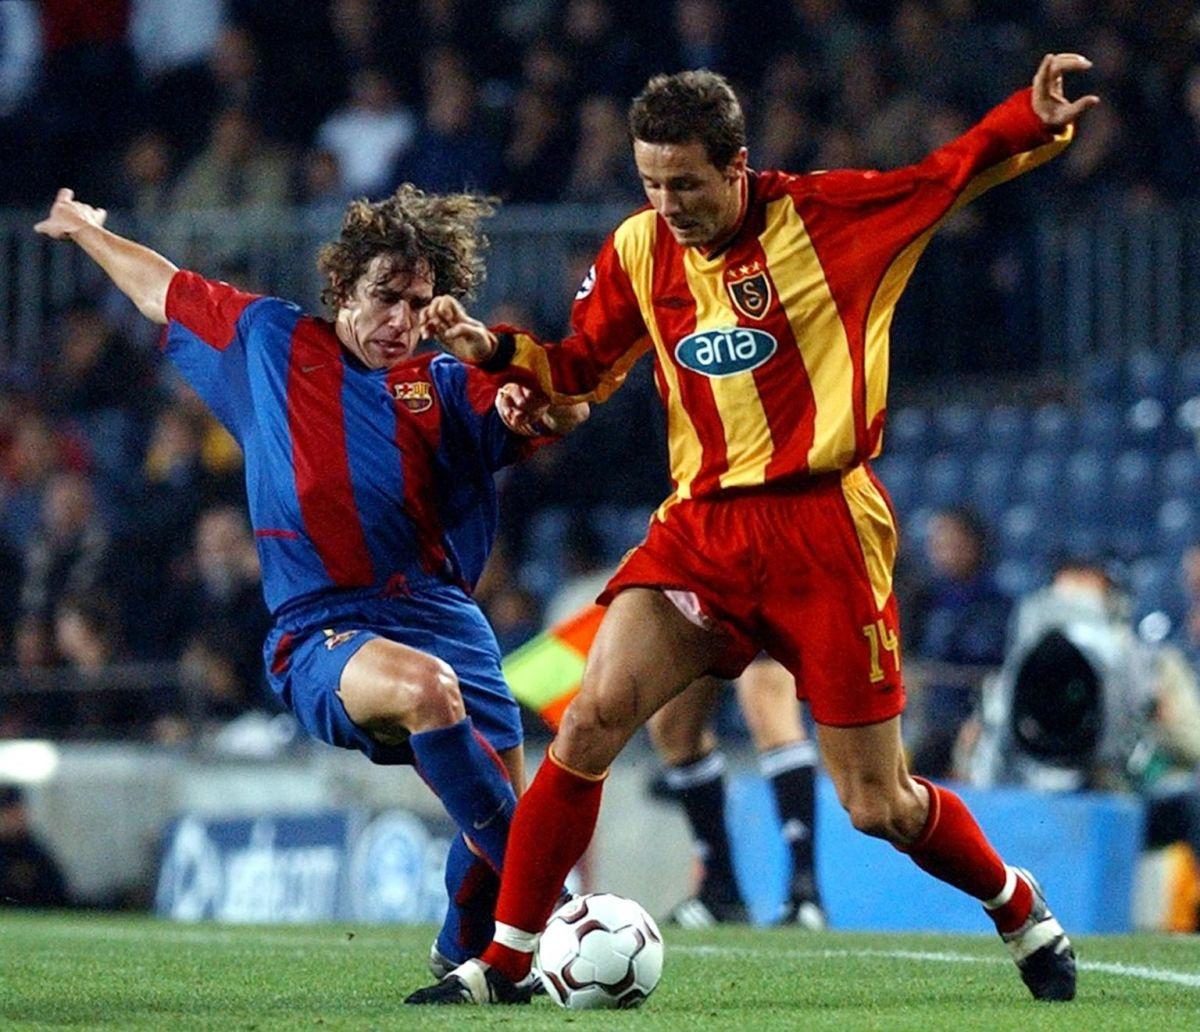 soccer-champions-barcelona-galatasaray-5d12513307e3b0b136000001.jpg